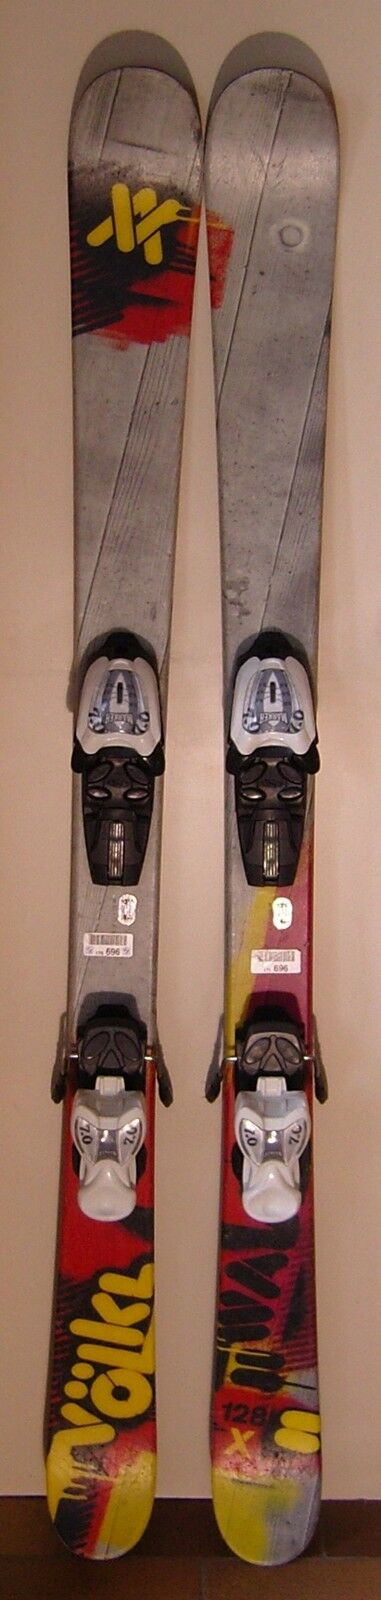 Ski d'occasion parabolique VOLKL Wall Junior - 128cm